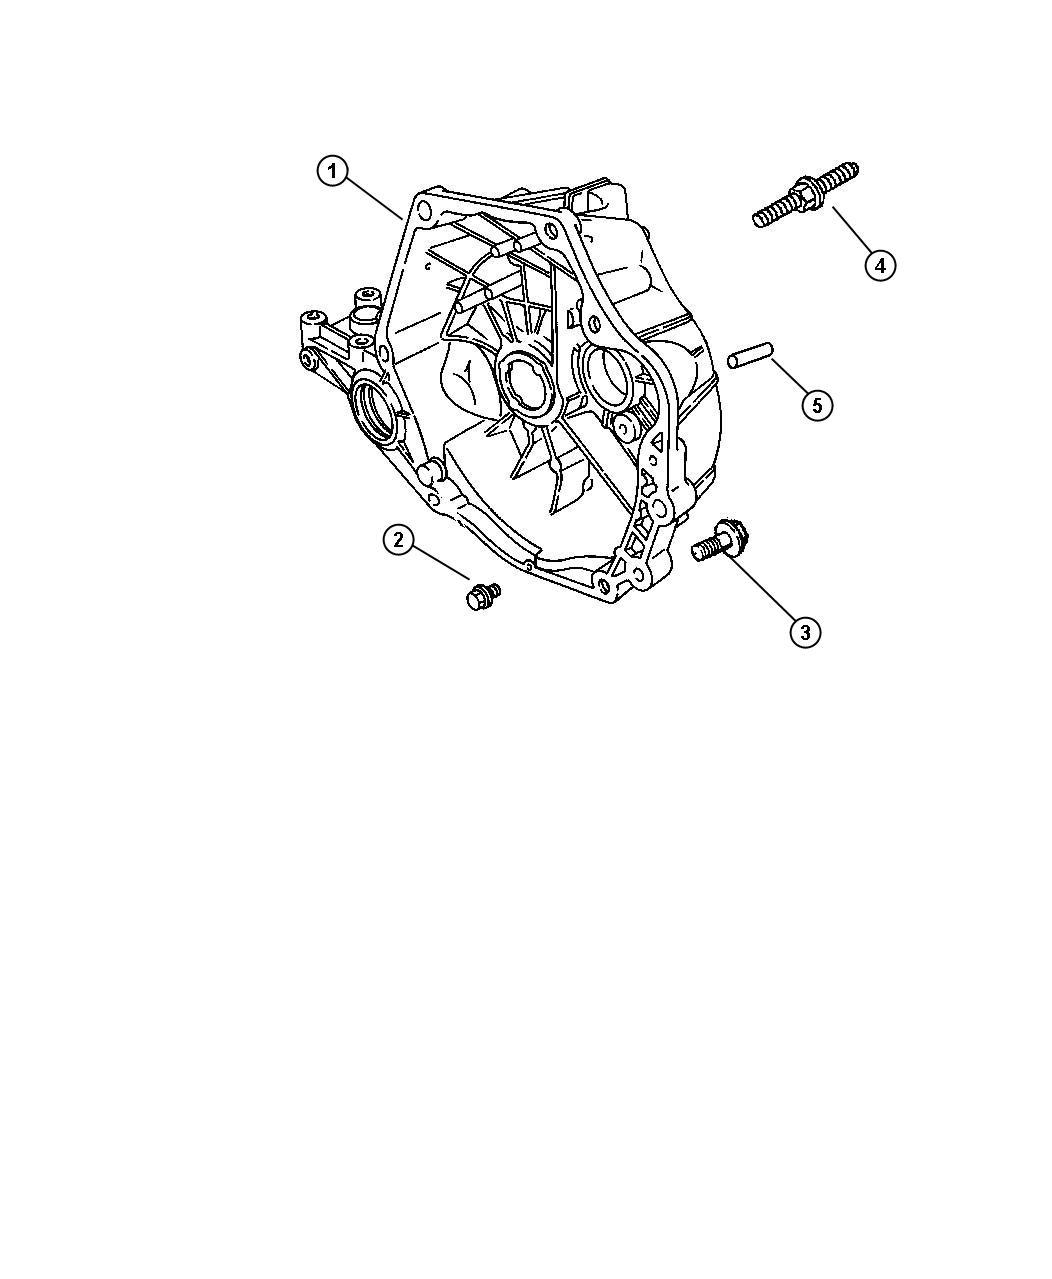 Dodge Stratus Bolt  Hex Head  M12-1 75x60  Mounting